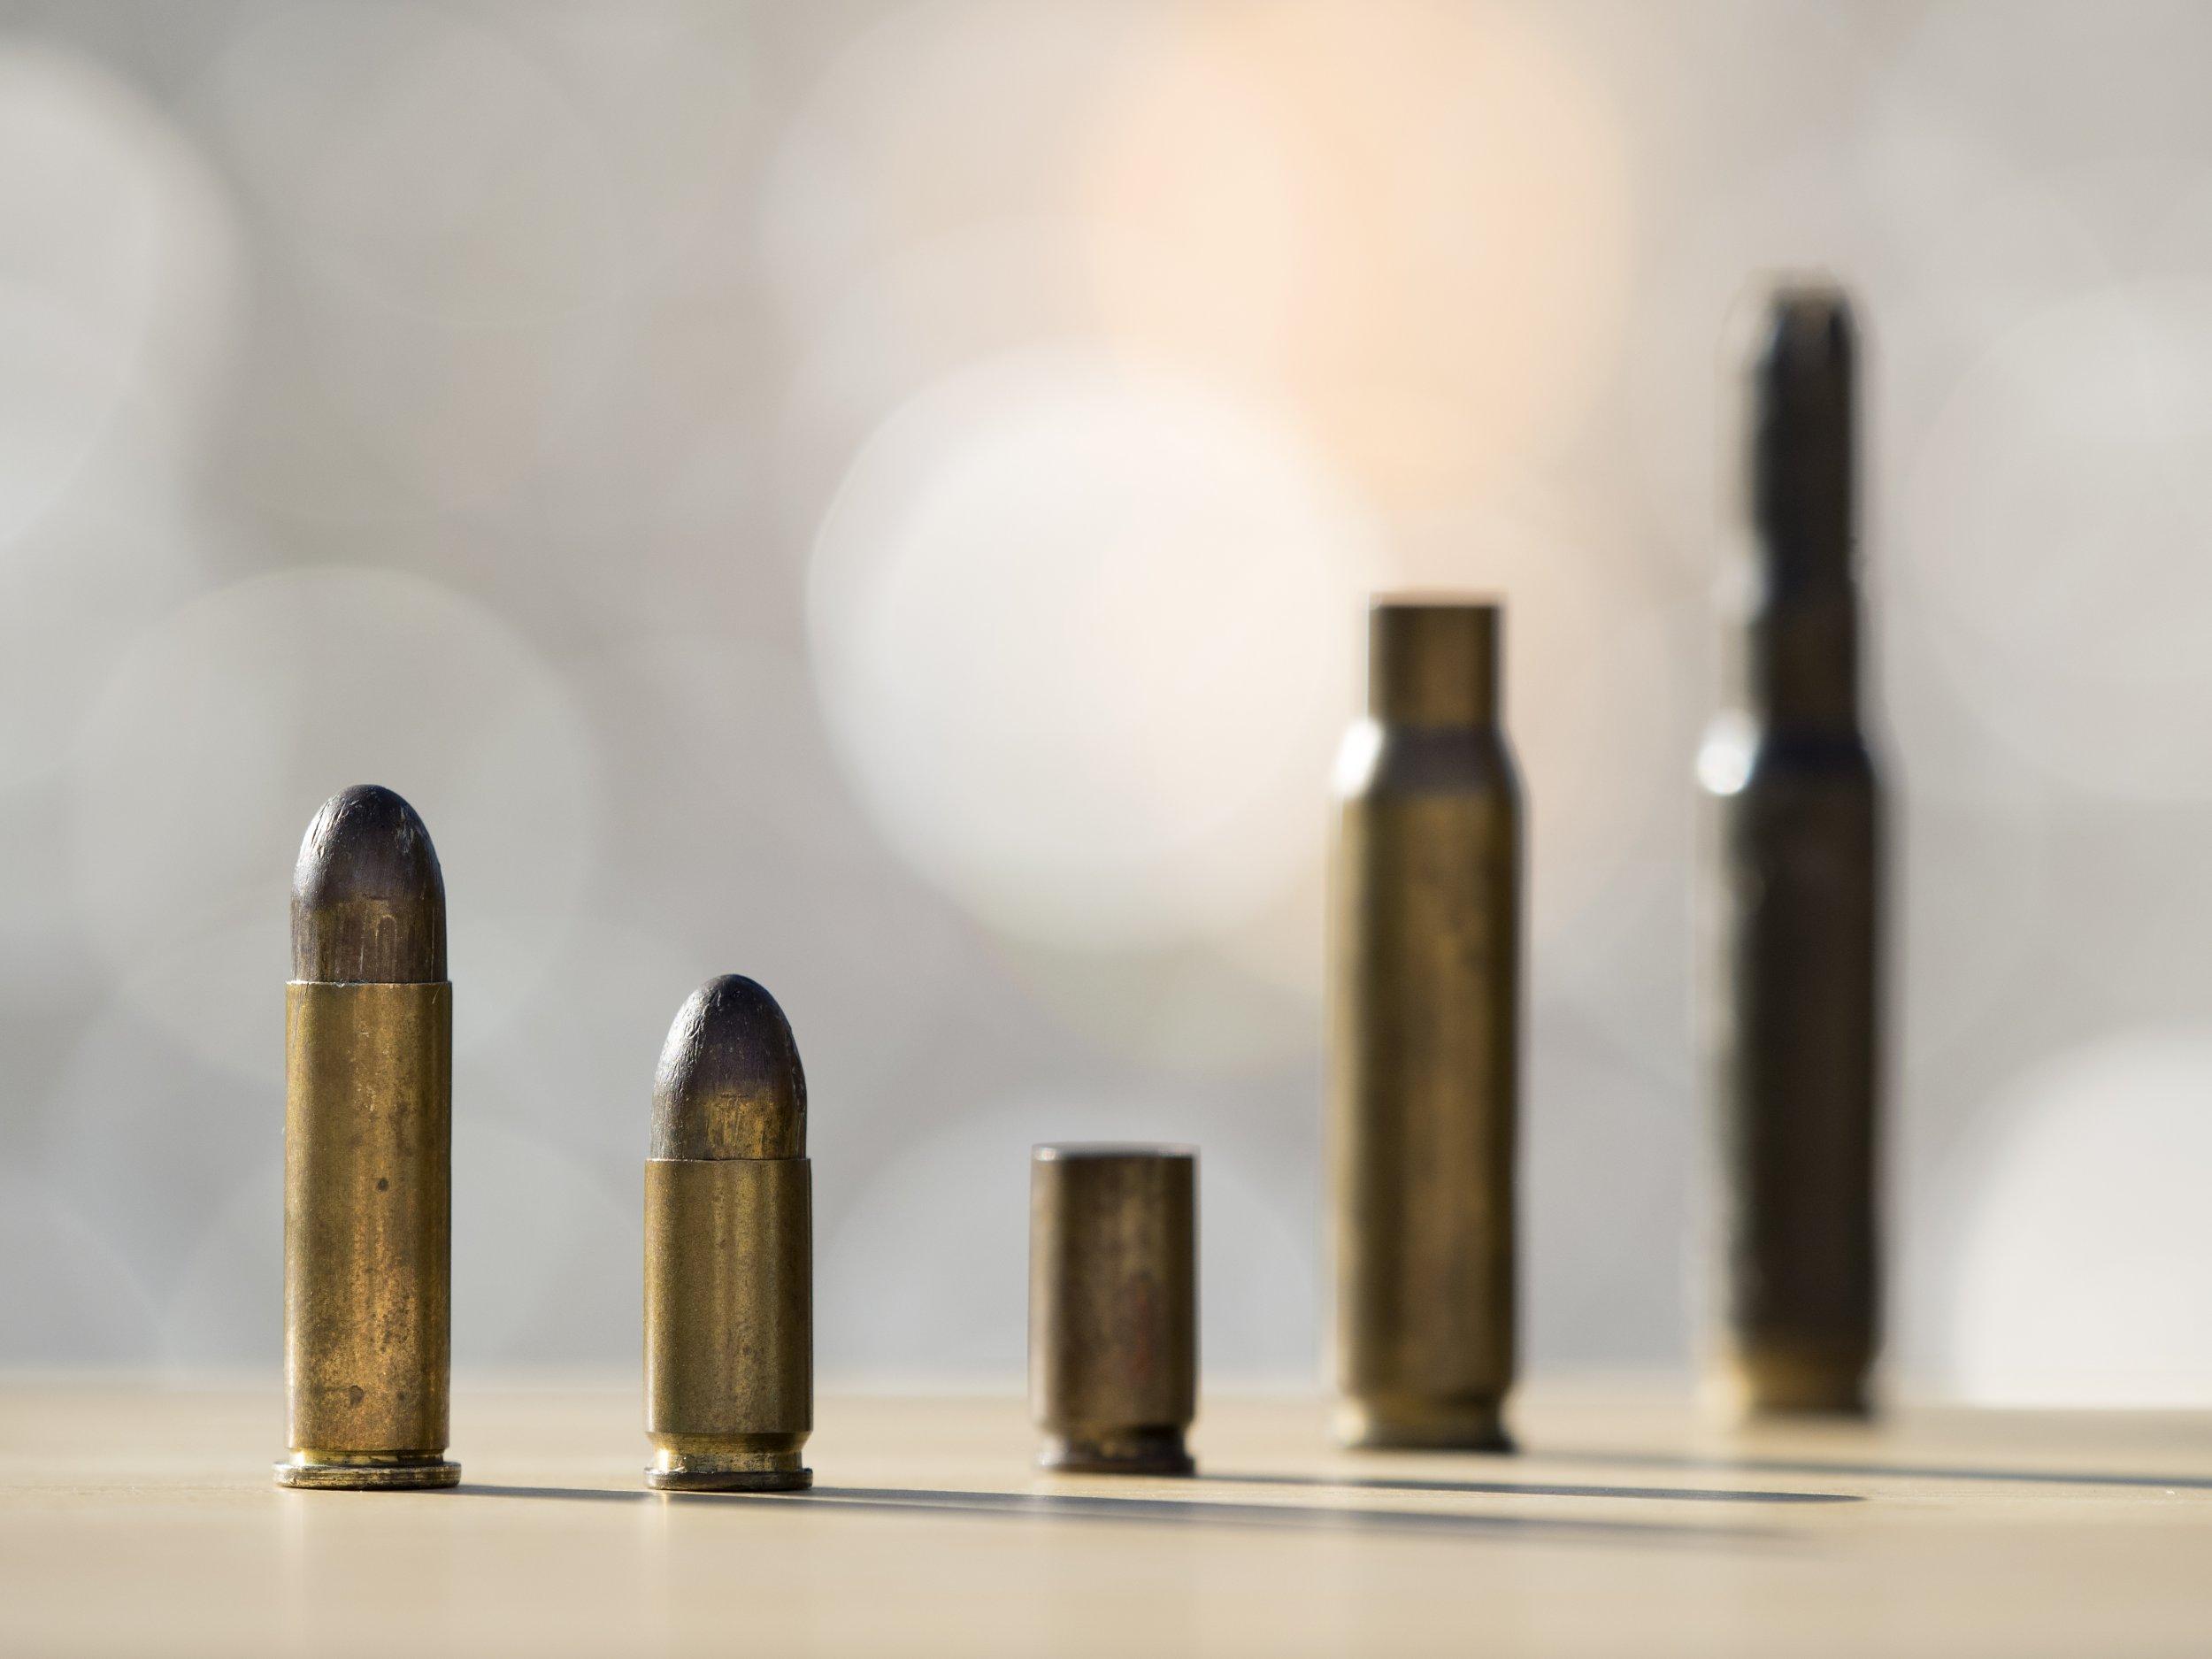 0317_lead_based_ammunition_01